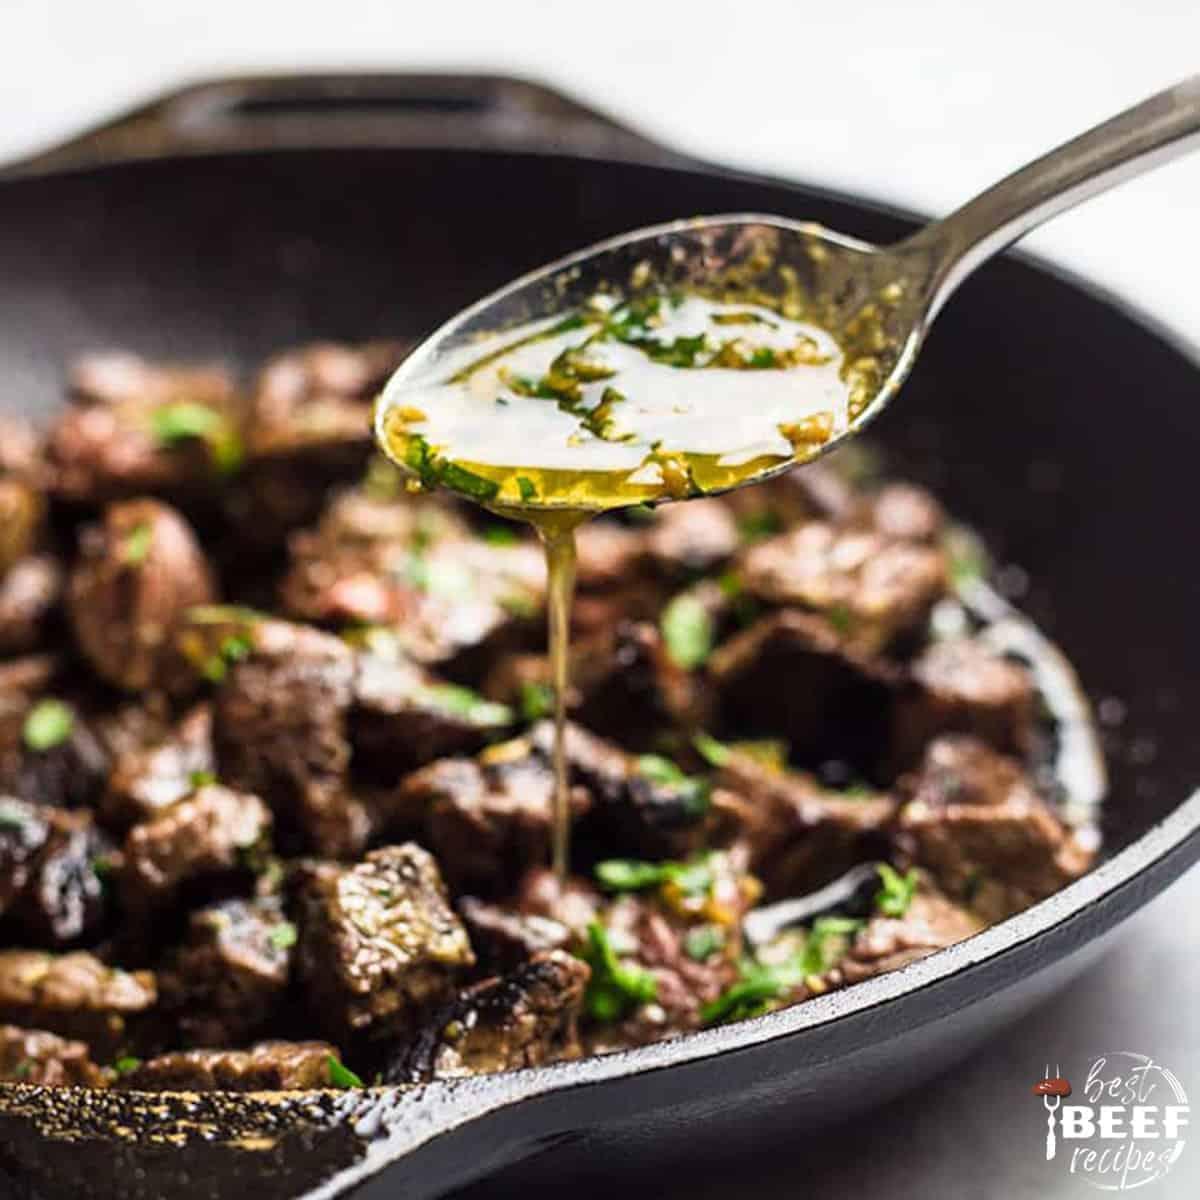 Pouring garlic butter over steak bites